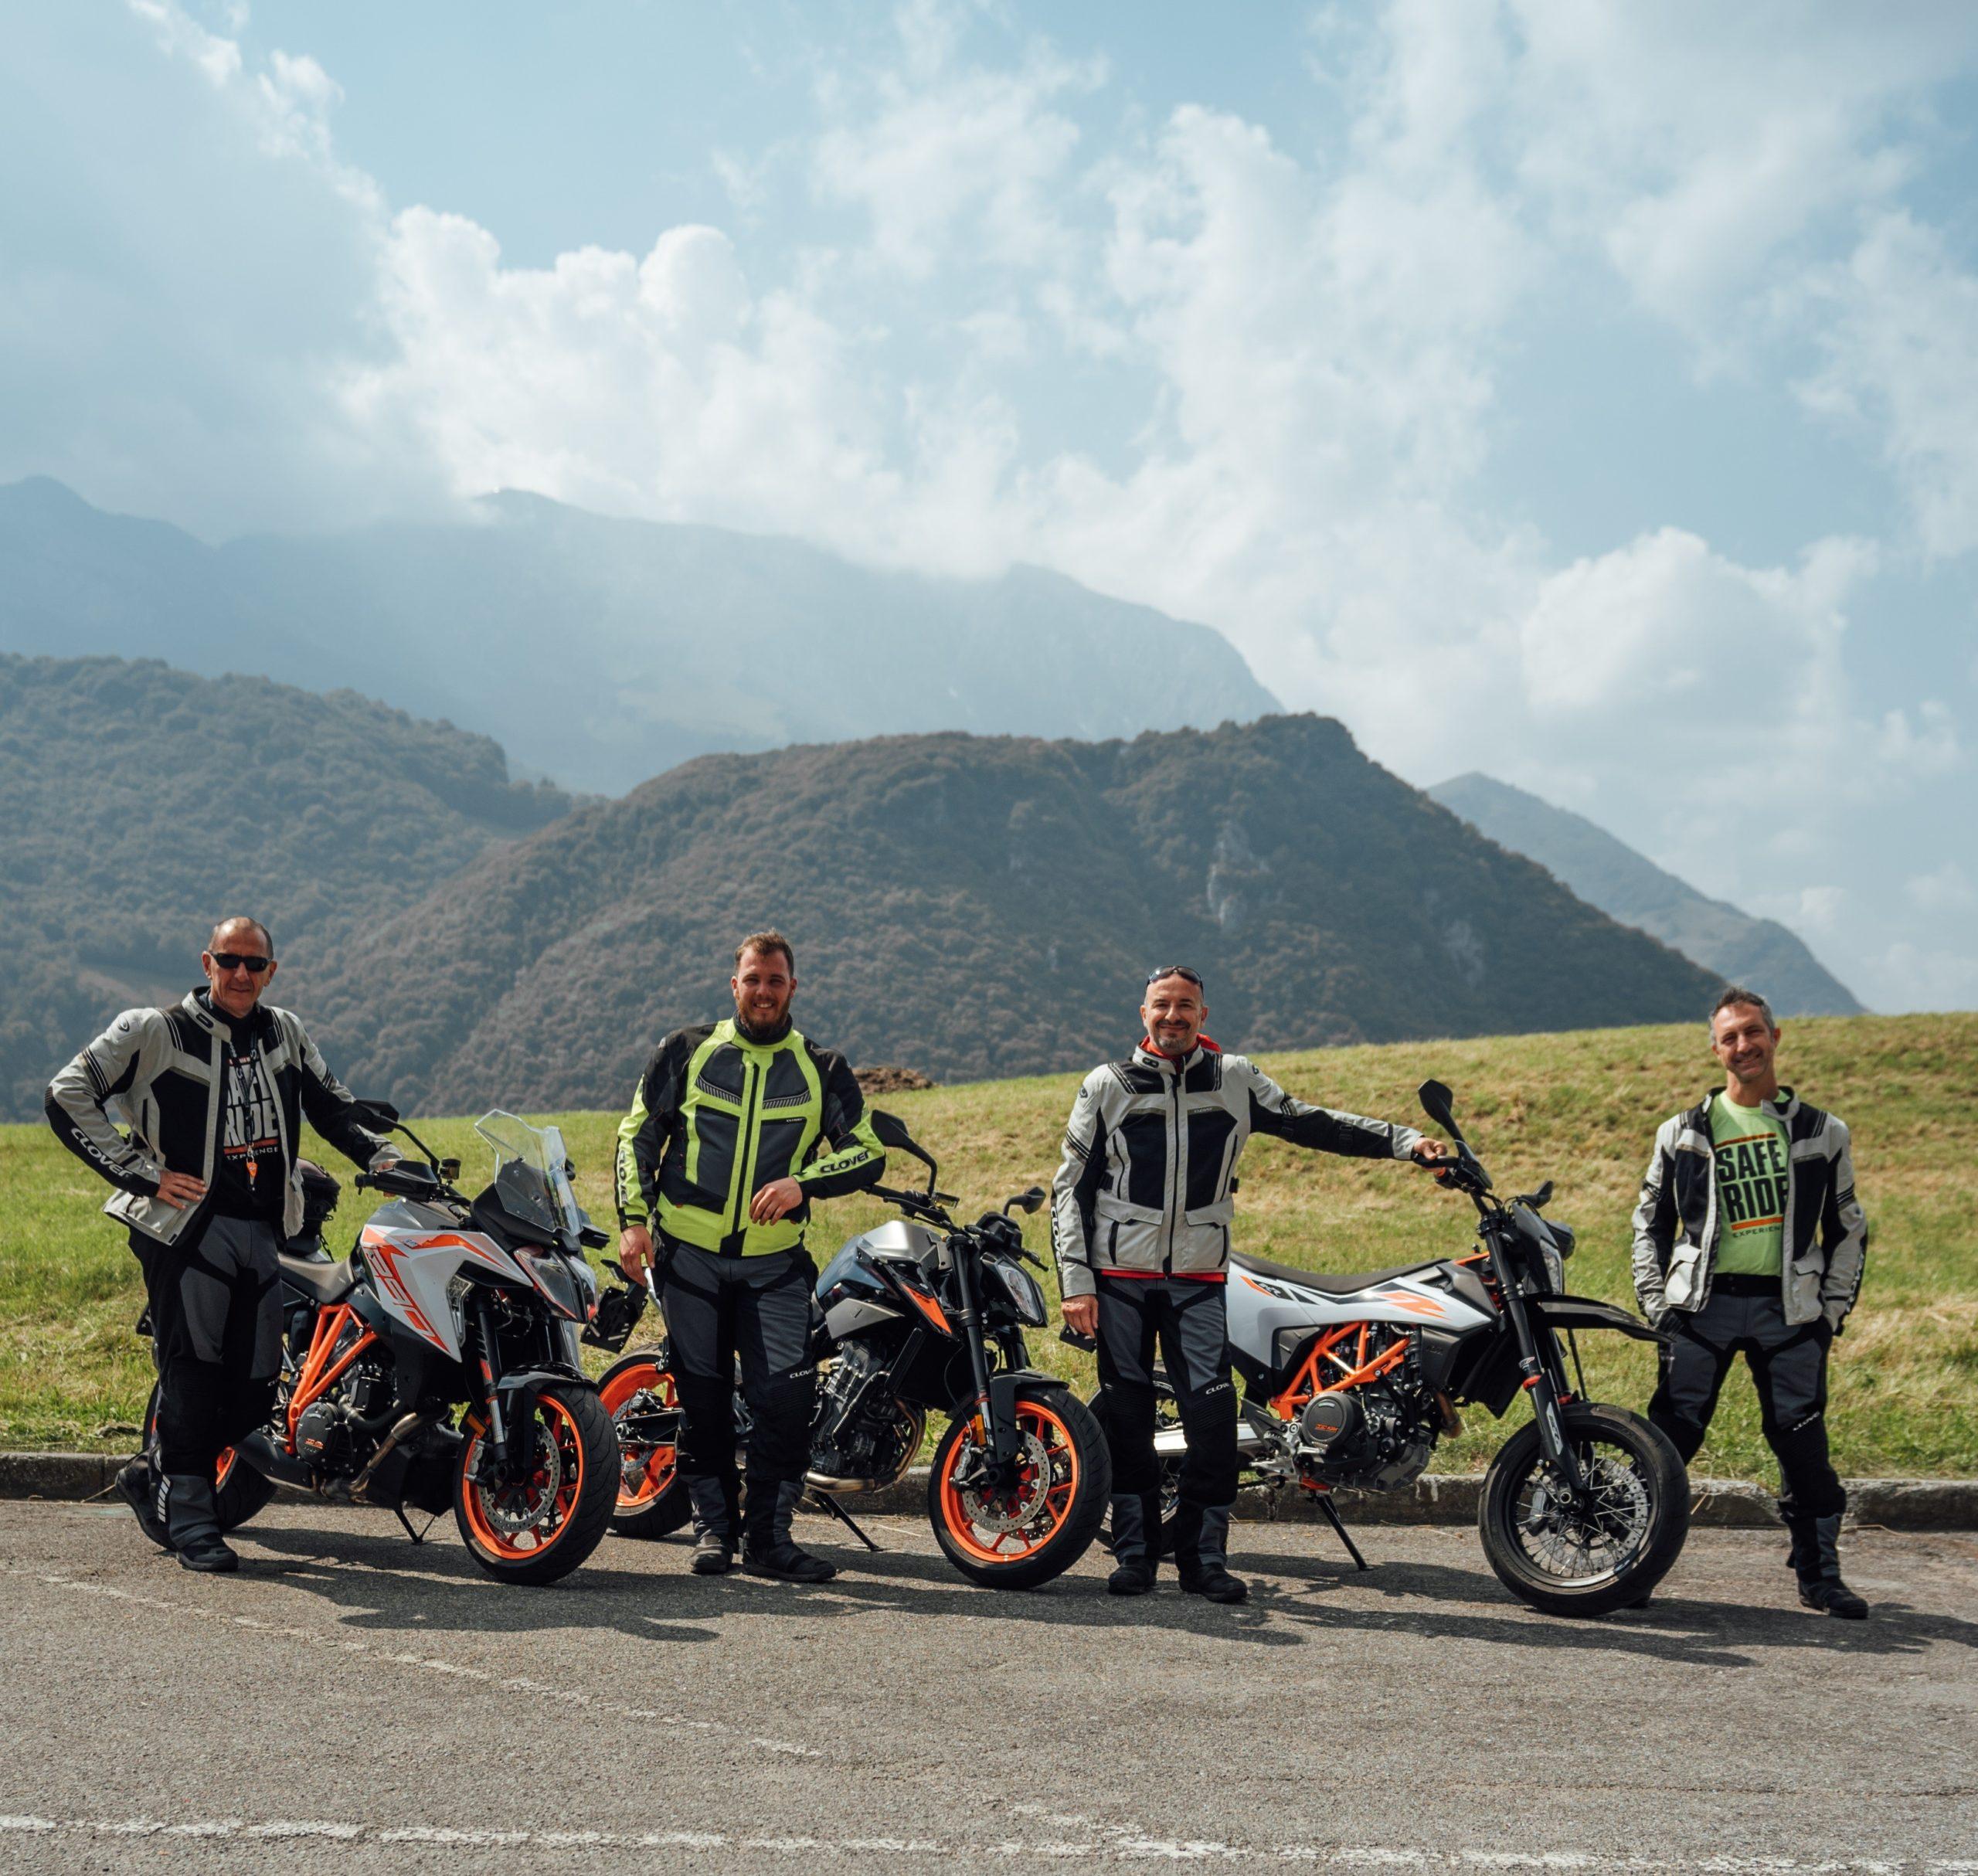 Safe Ride Istruttori